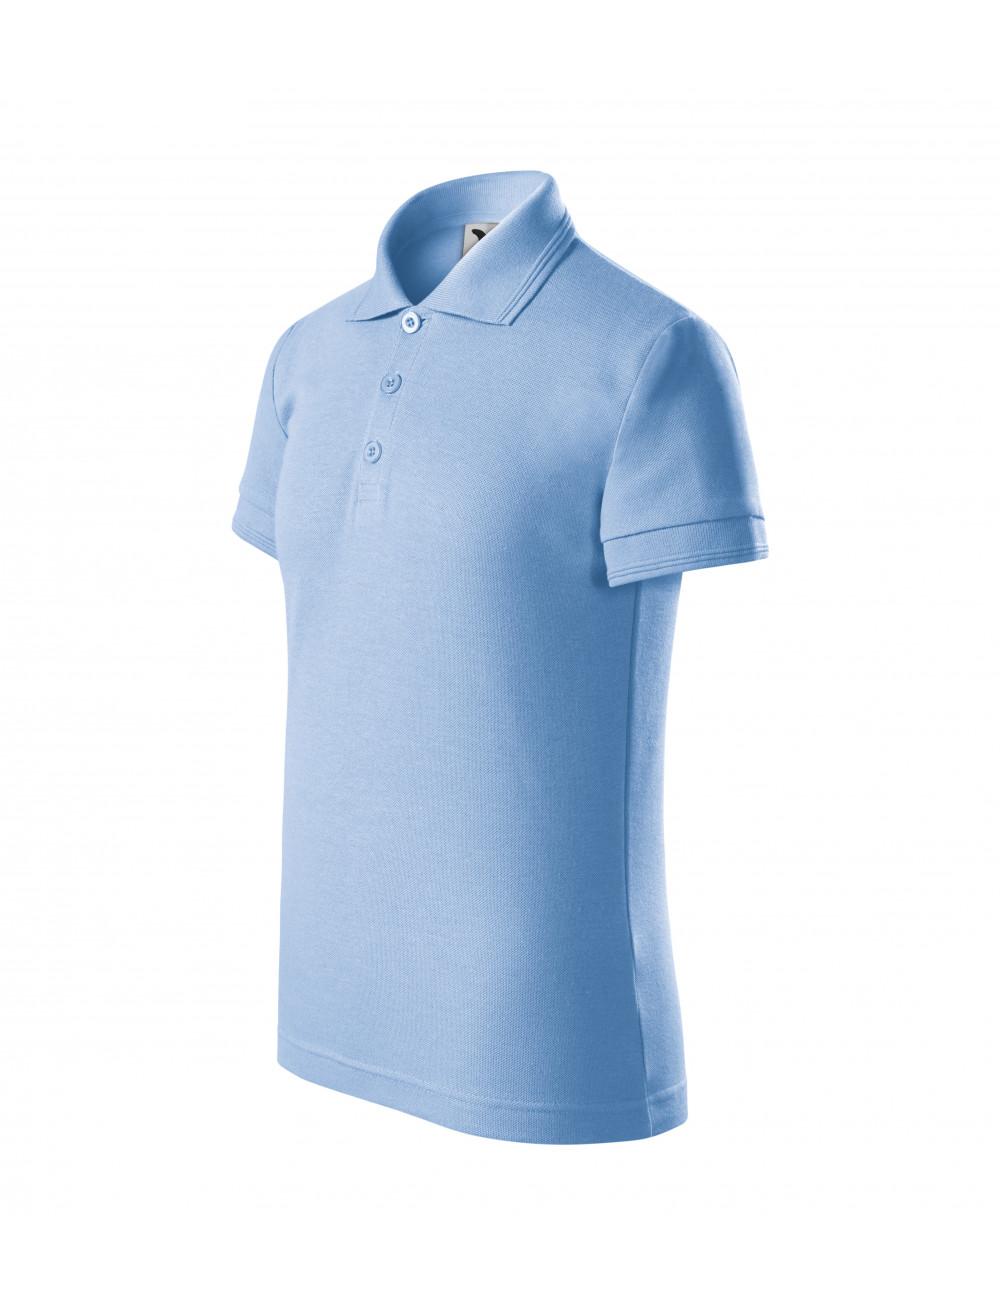 Adler MALFINI Koszulka polo dziecięca Pique Polo 222 błękitny